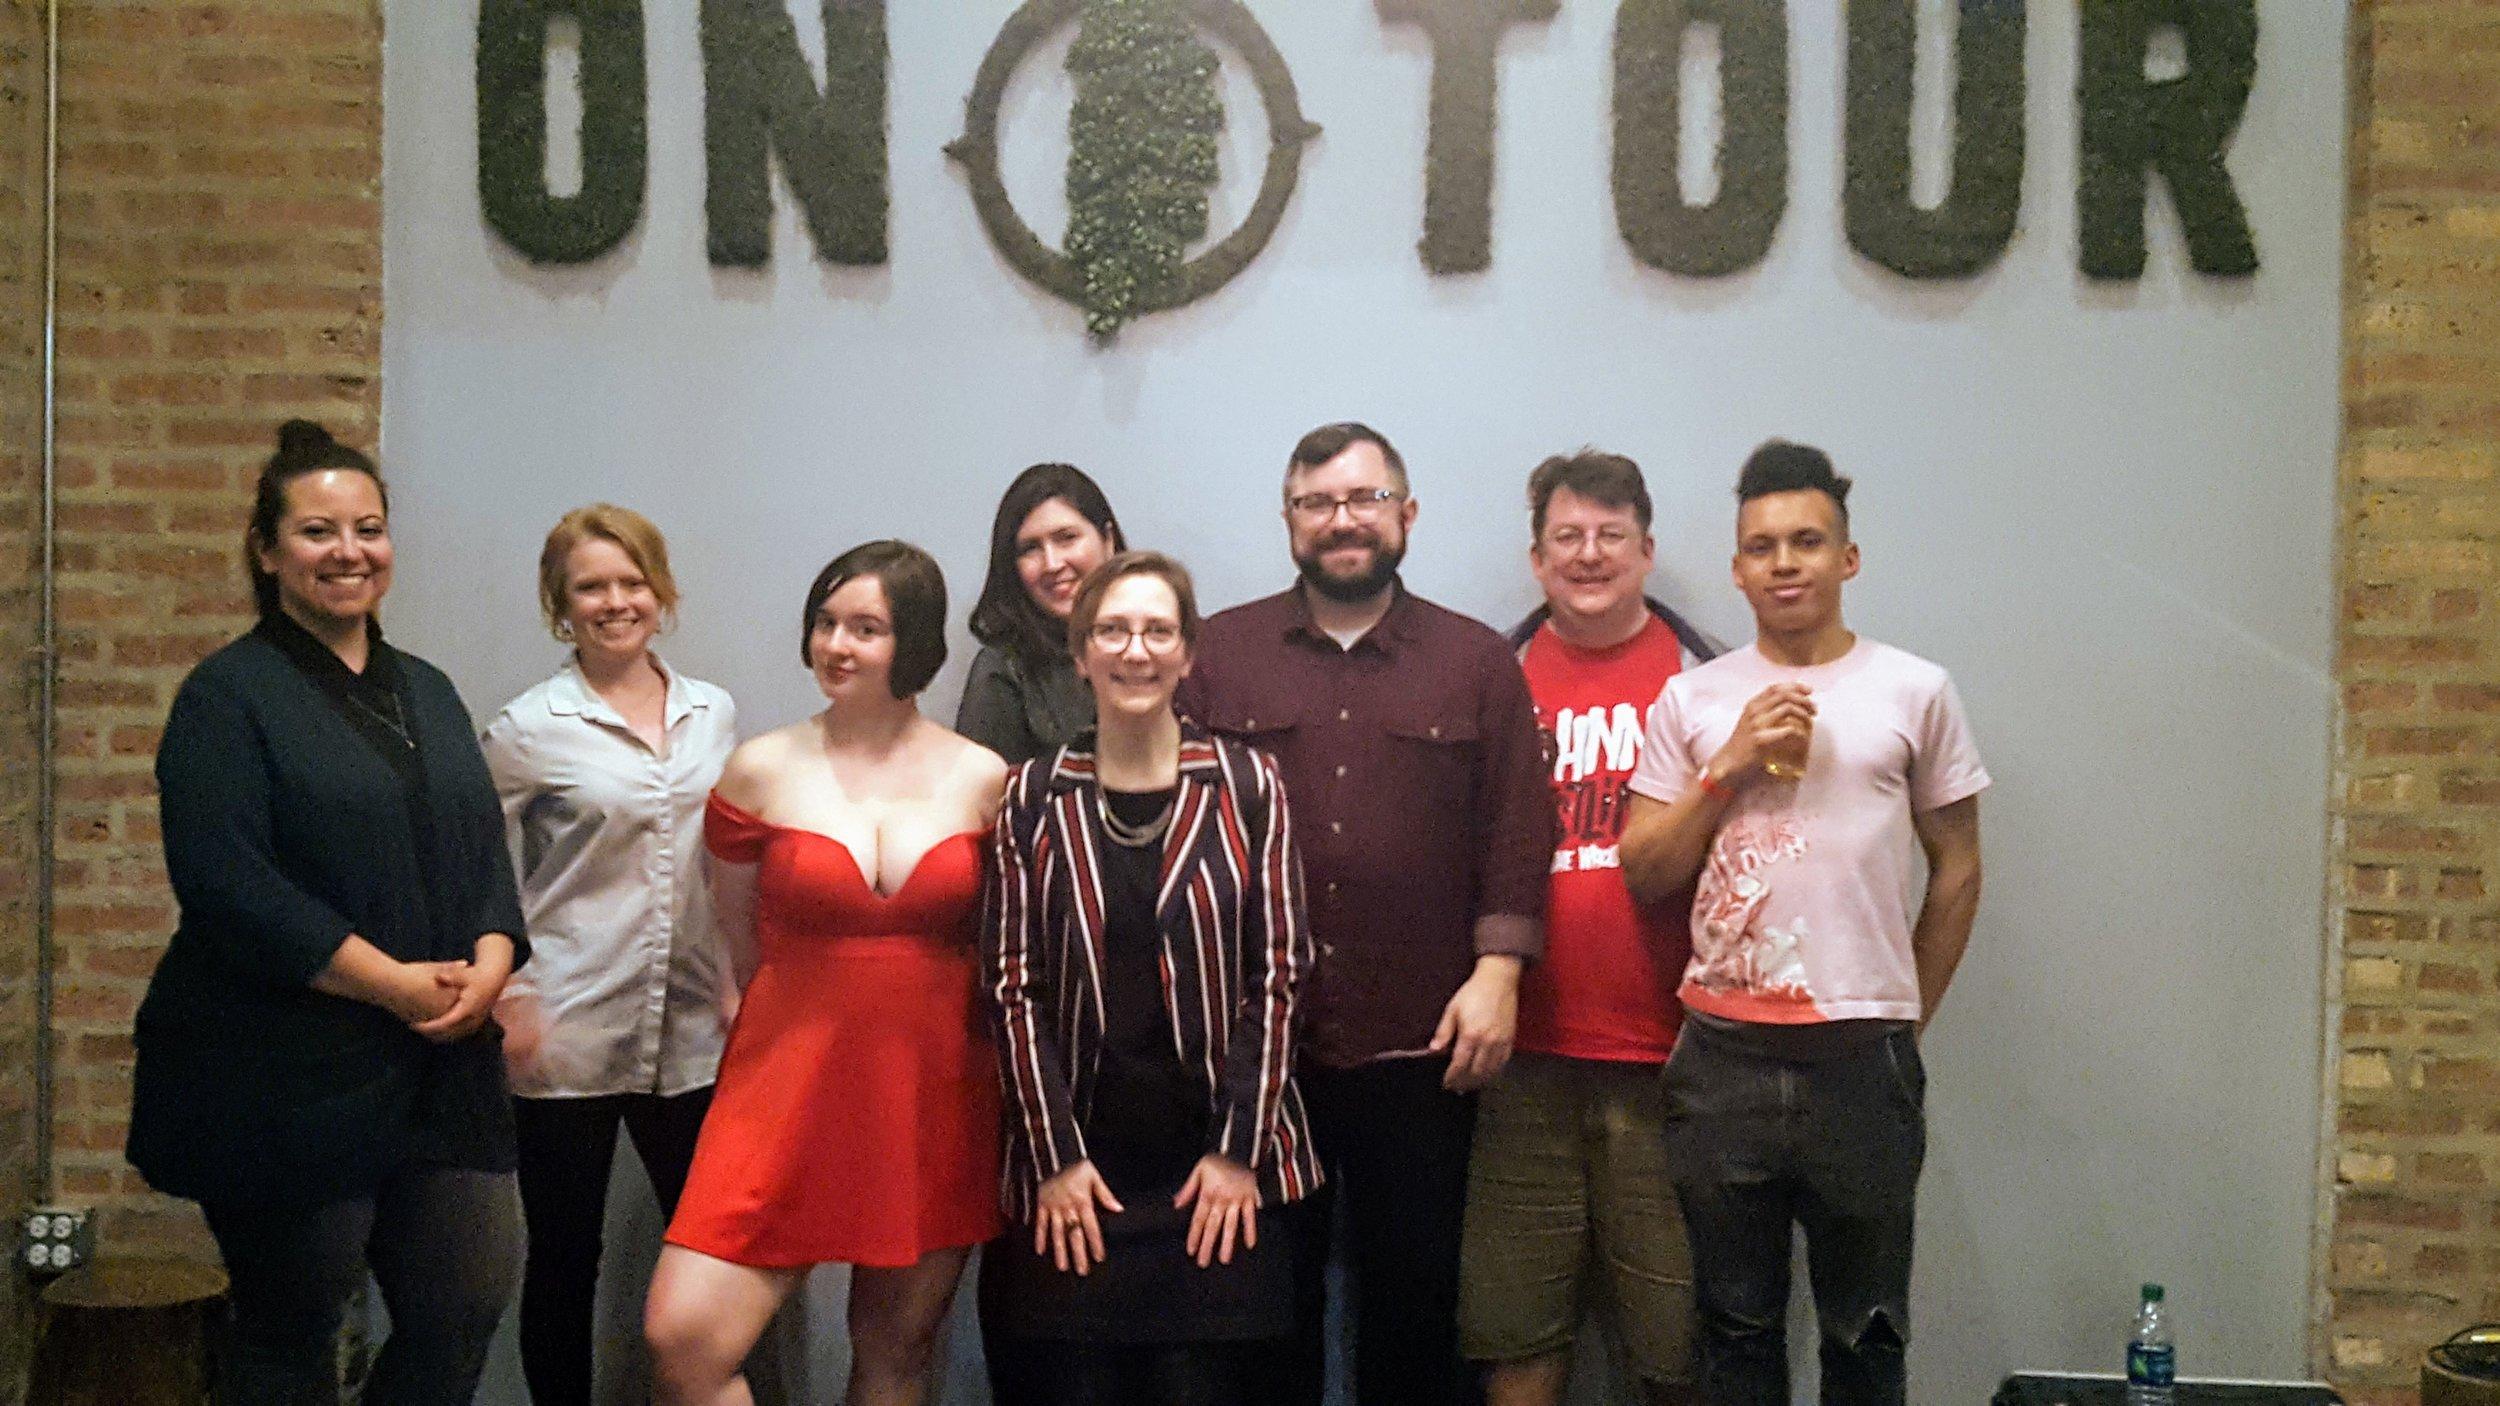 Dee Fuentes, Sarah Steimer, J.J. Ranvier, Gina Watters, Christina Brandon, Jason Fabeck, John Weagley, Tristan Zemtseff. (Not pictured: Amanda ReCupido).